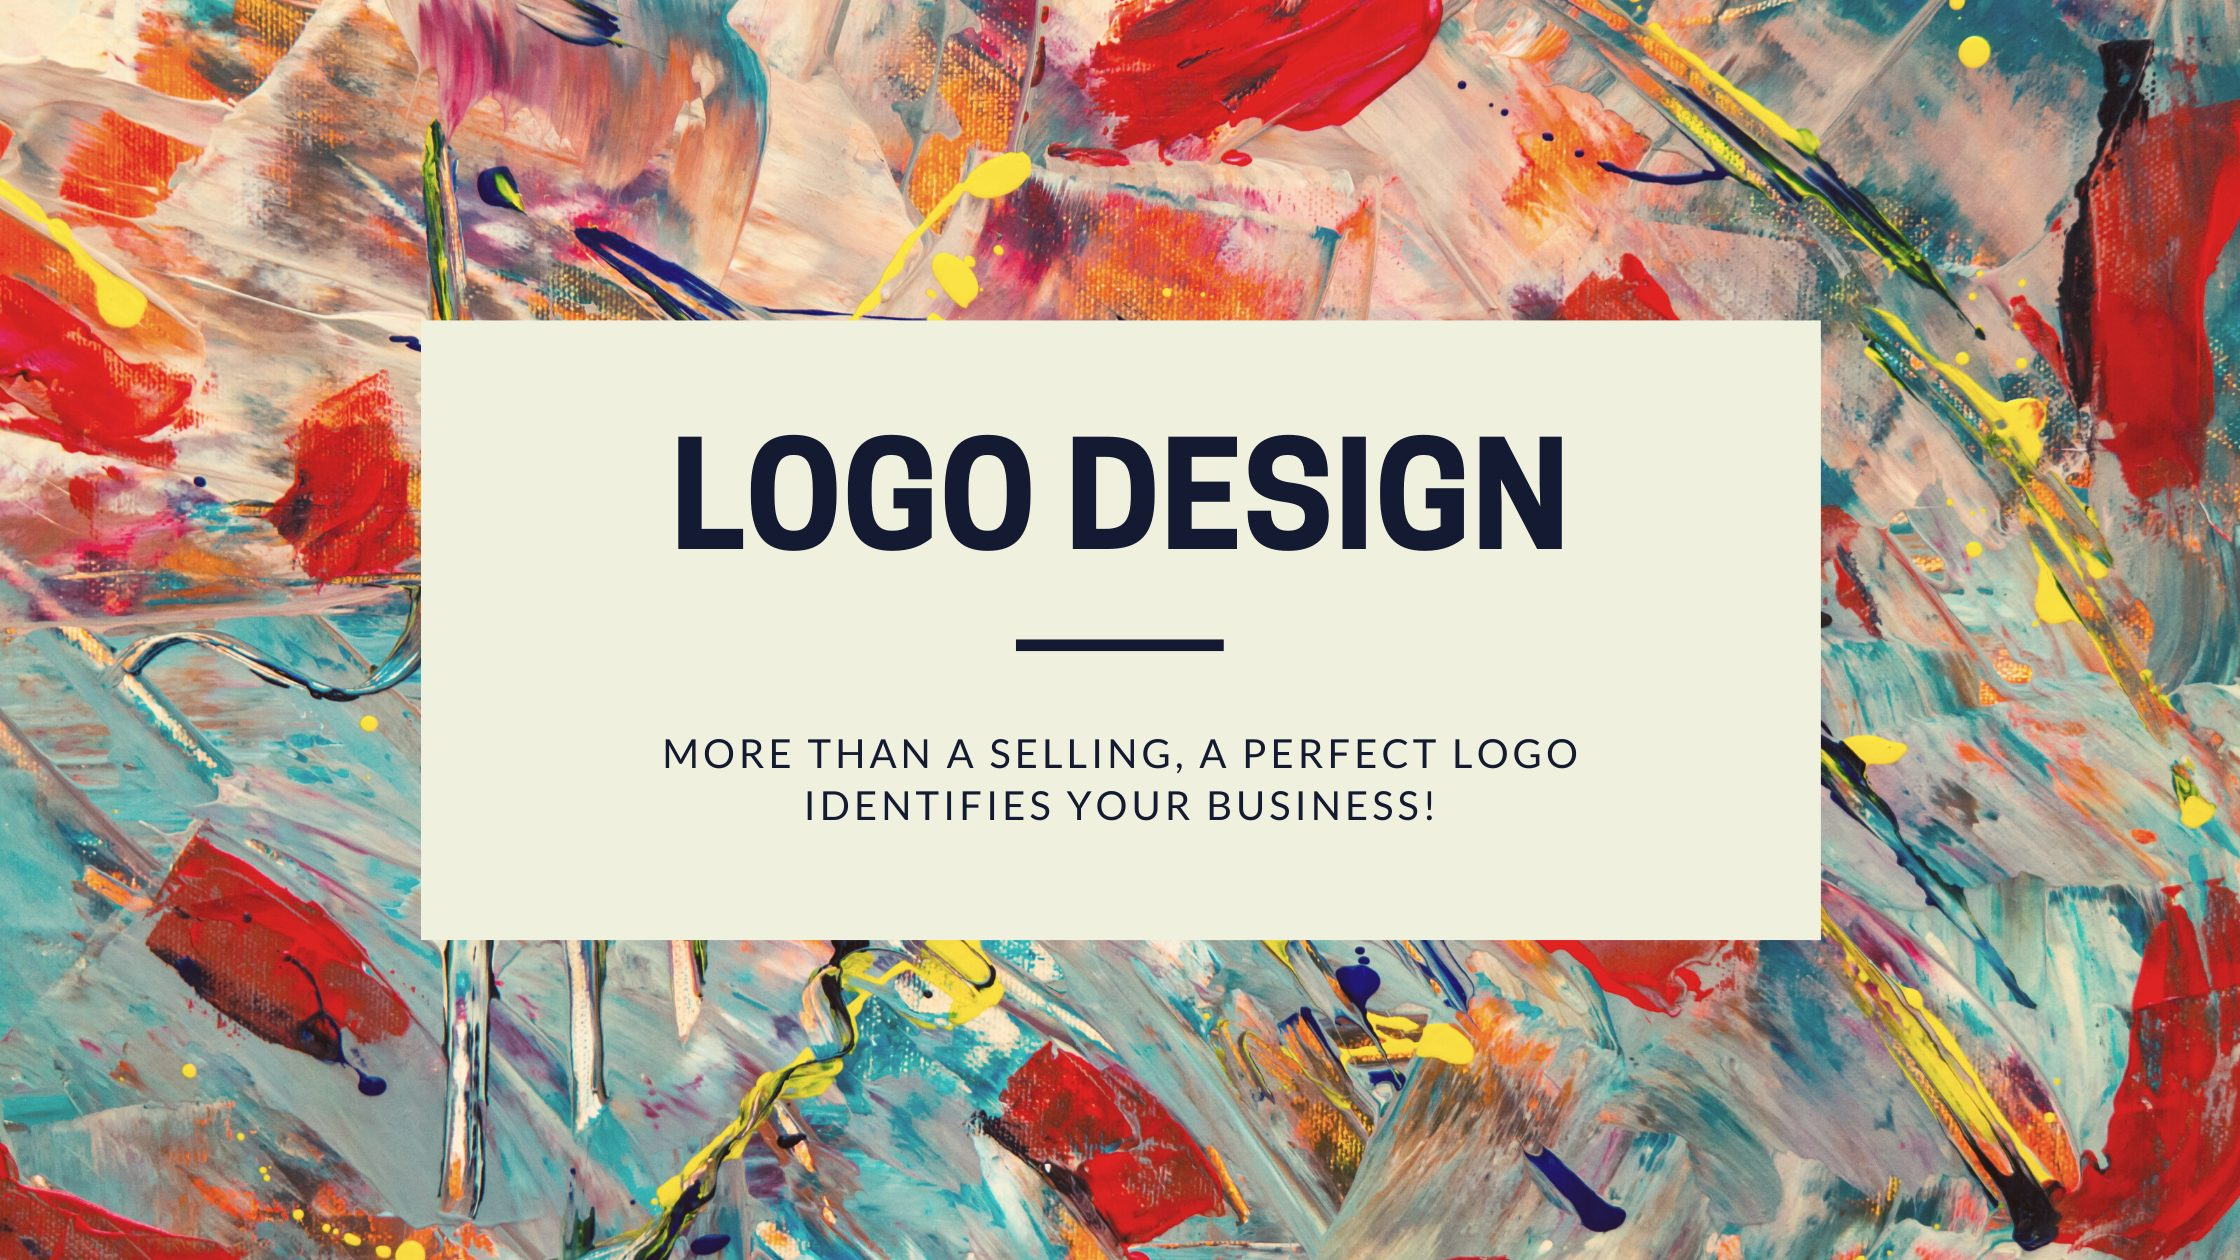 Logo Design Impact Your Brand Image